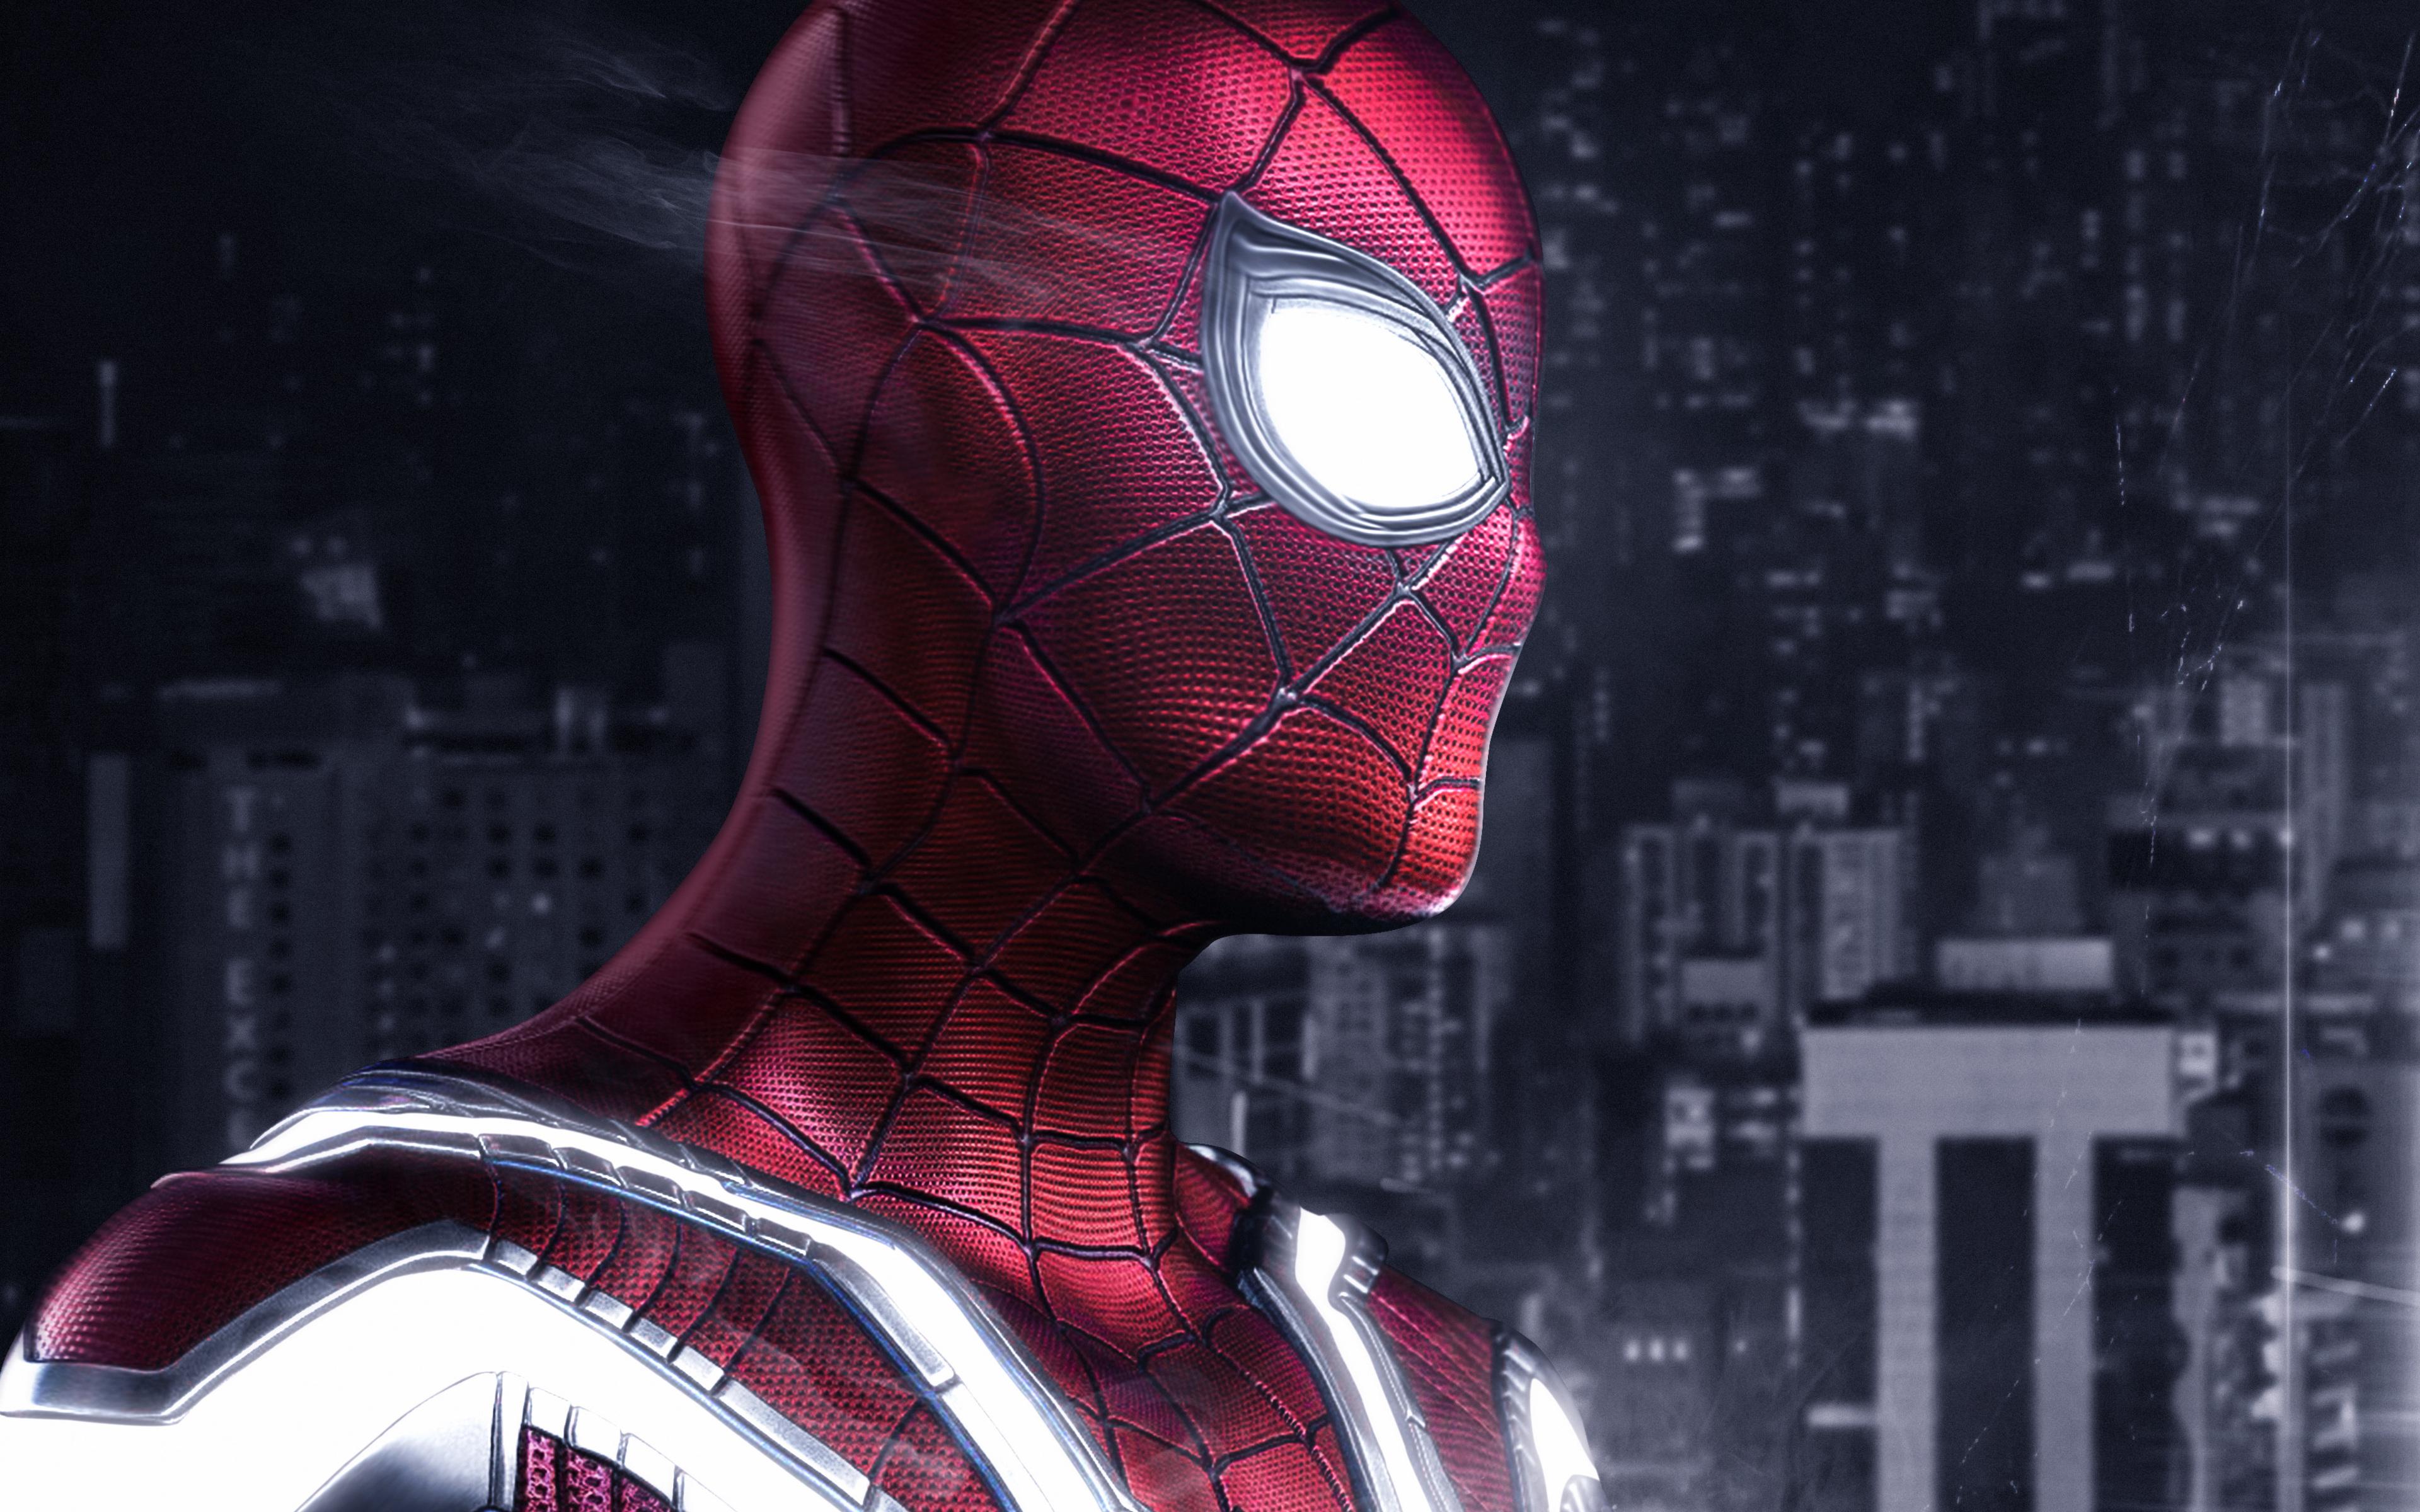 3840x2400 Spiderman PS4 Artwork 4k HD 4k Wallpapers ...